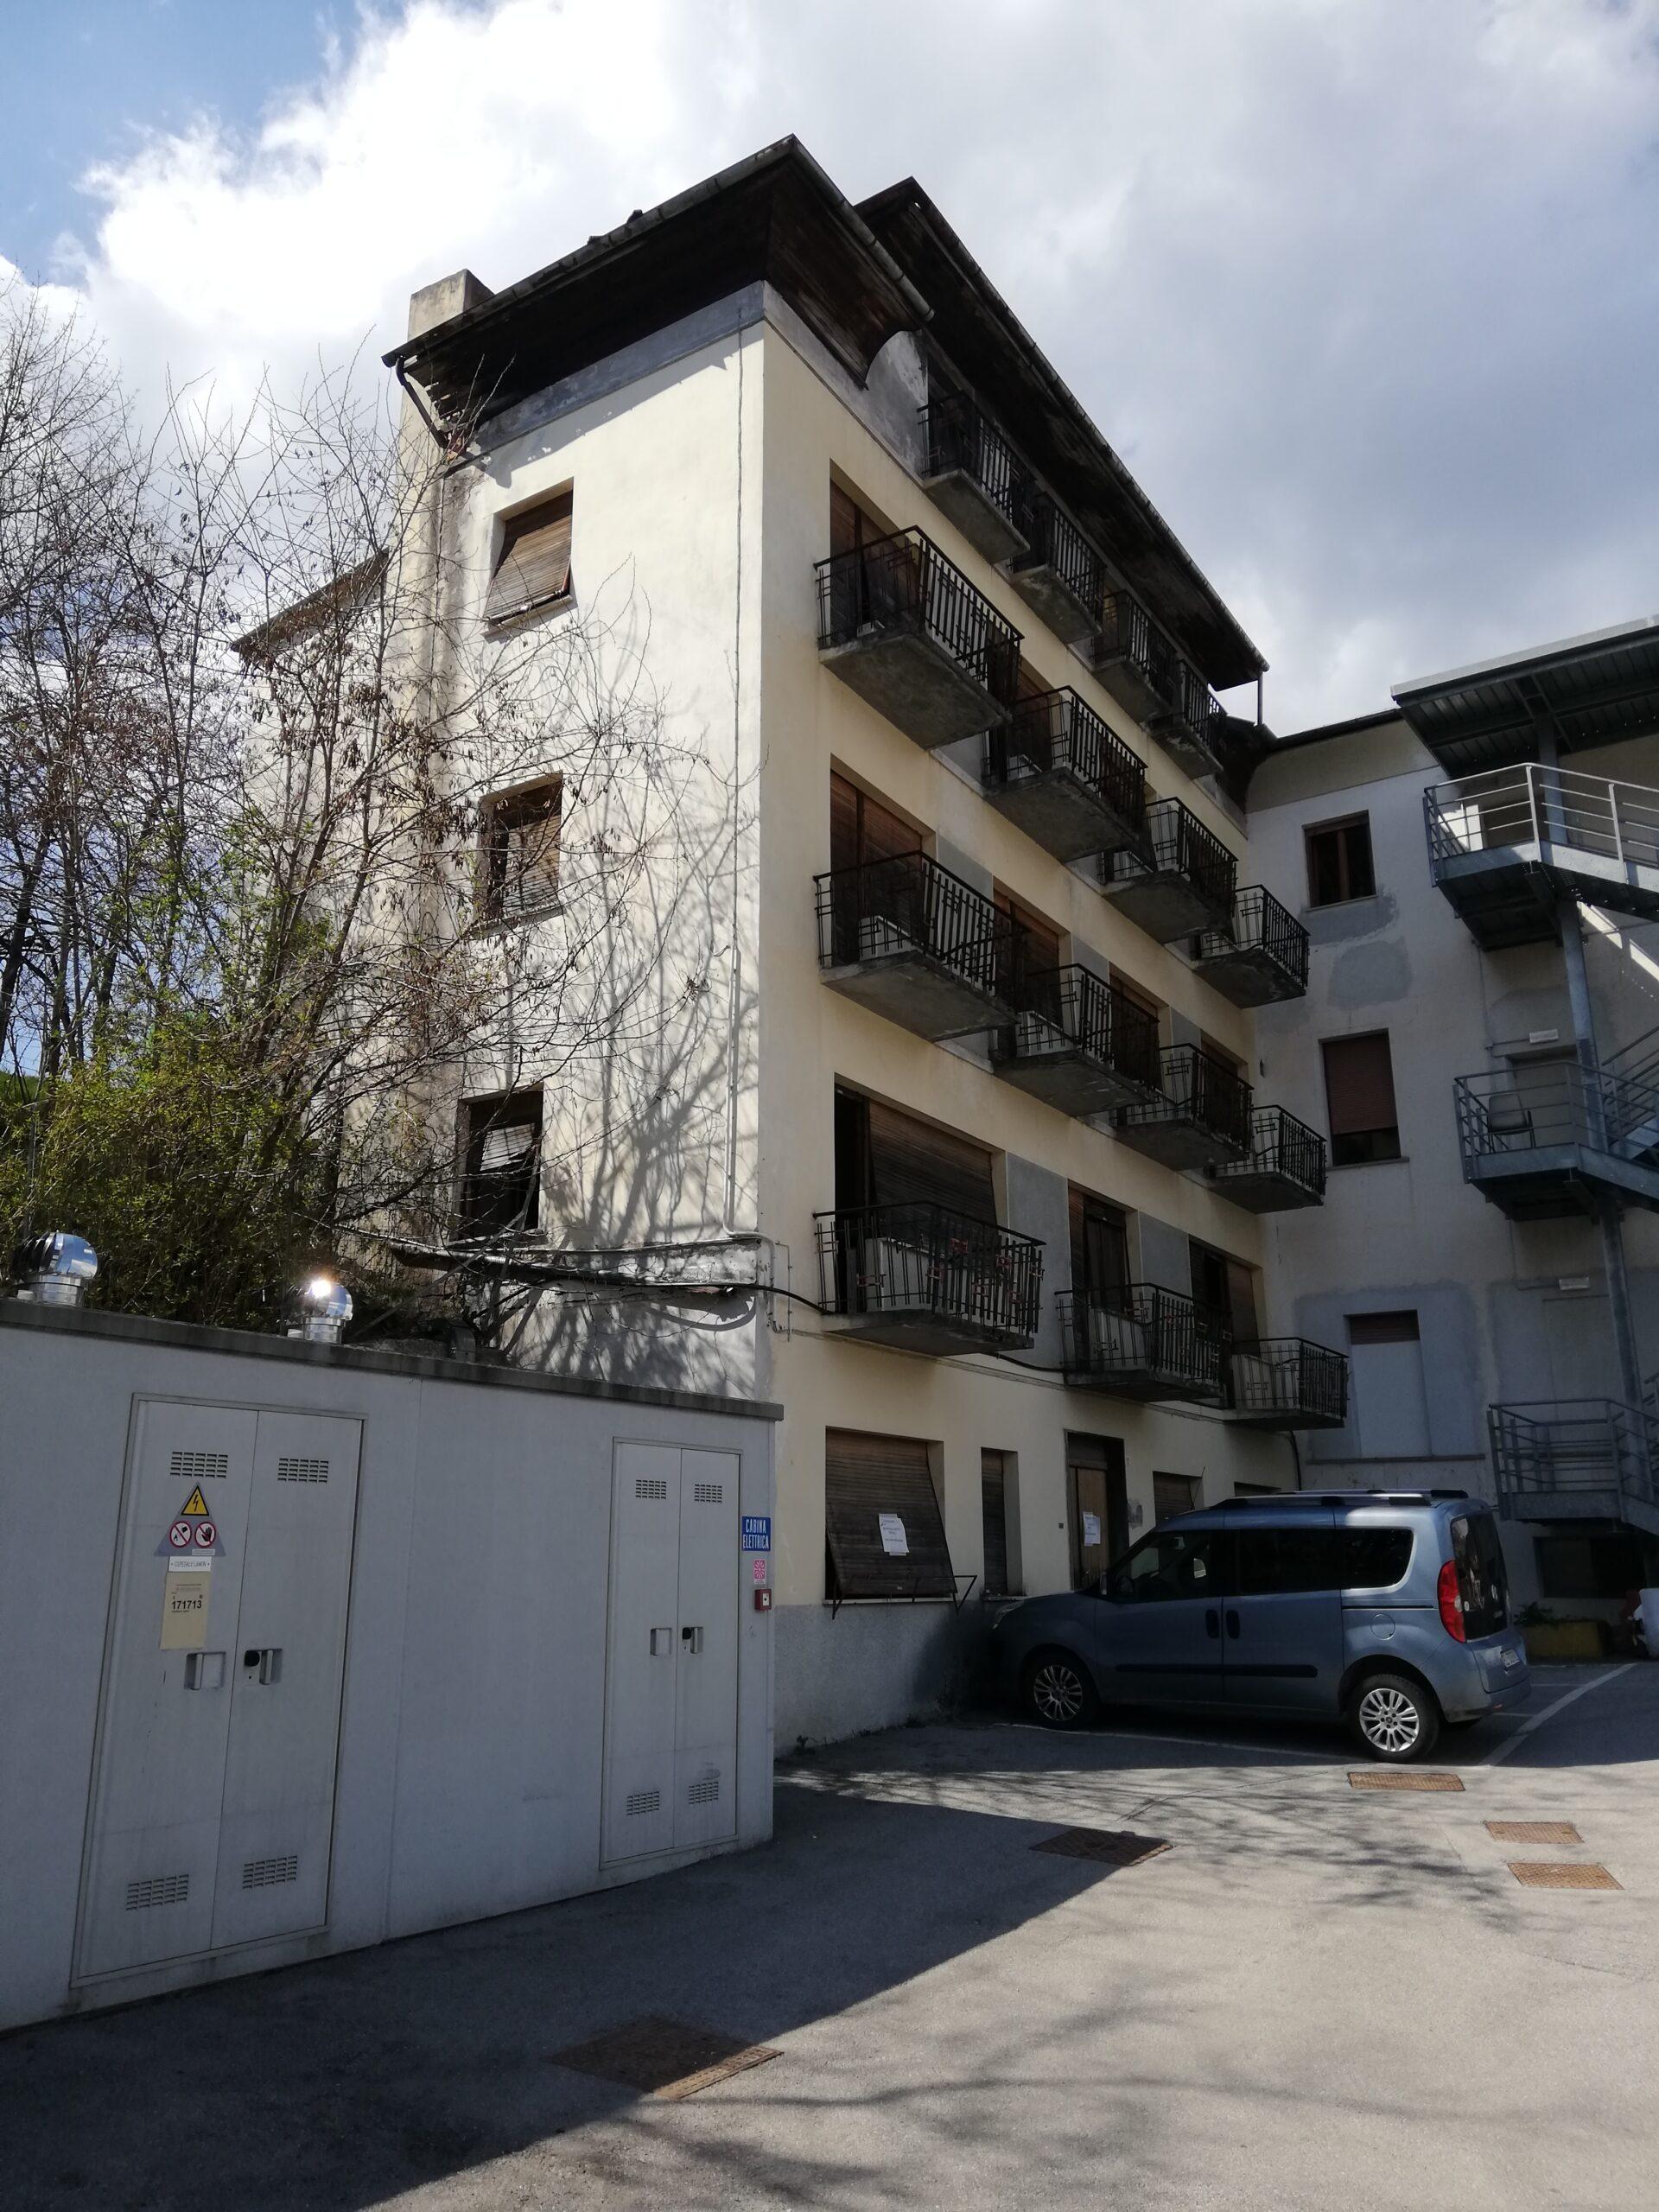 Demolizione Aulss Dolomiti Ospedale Lamon